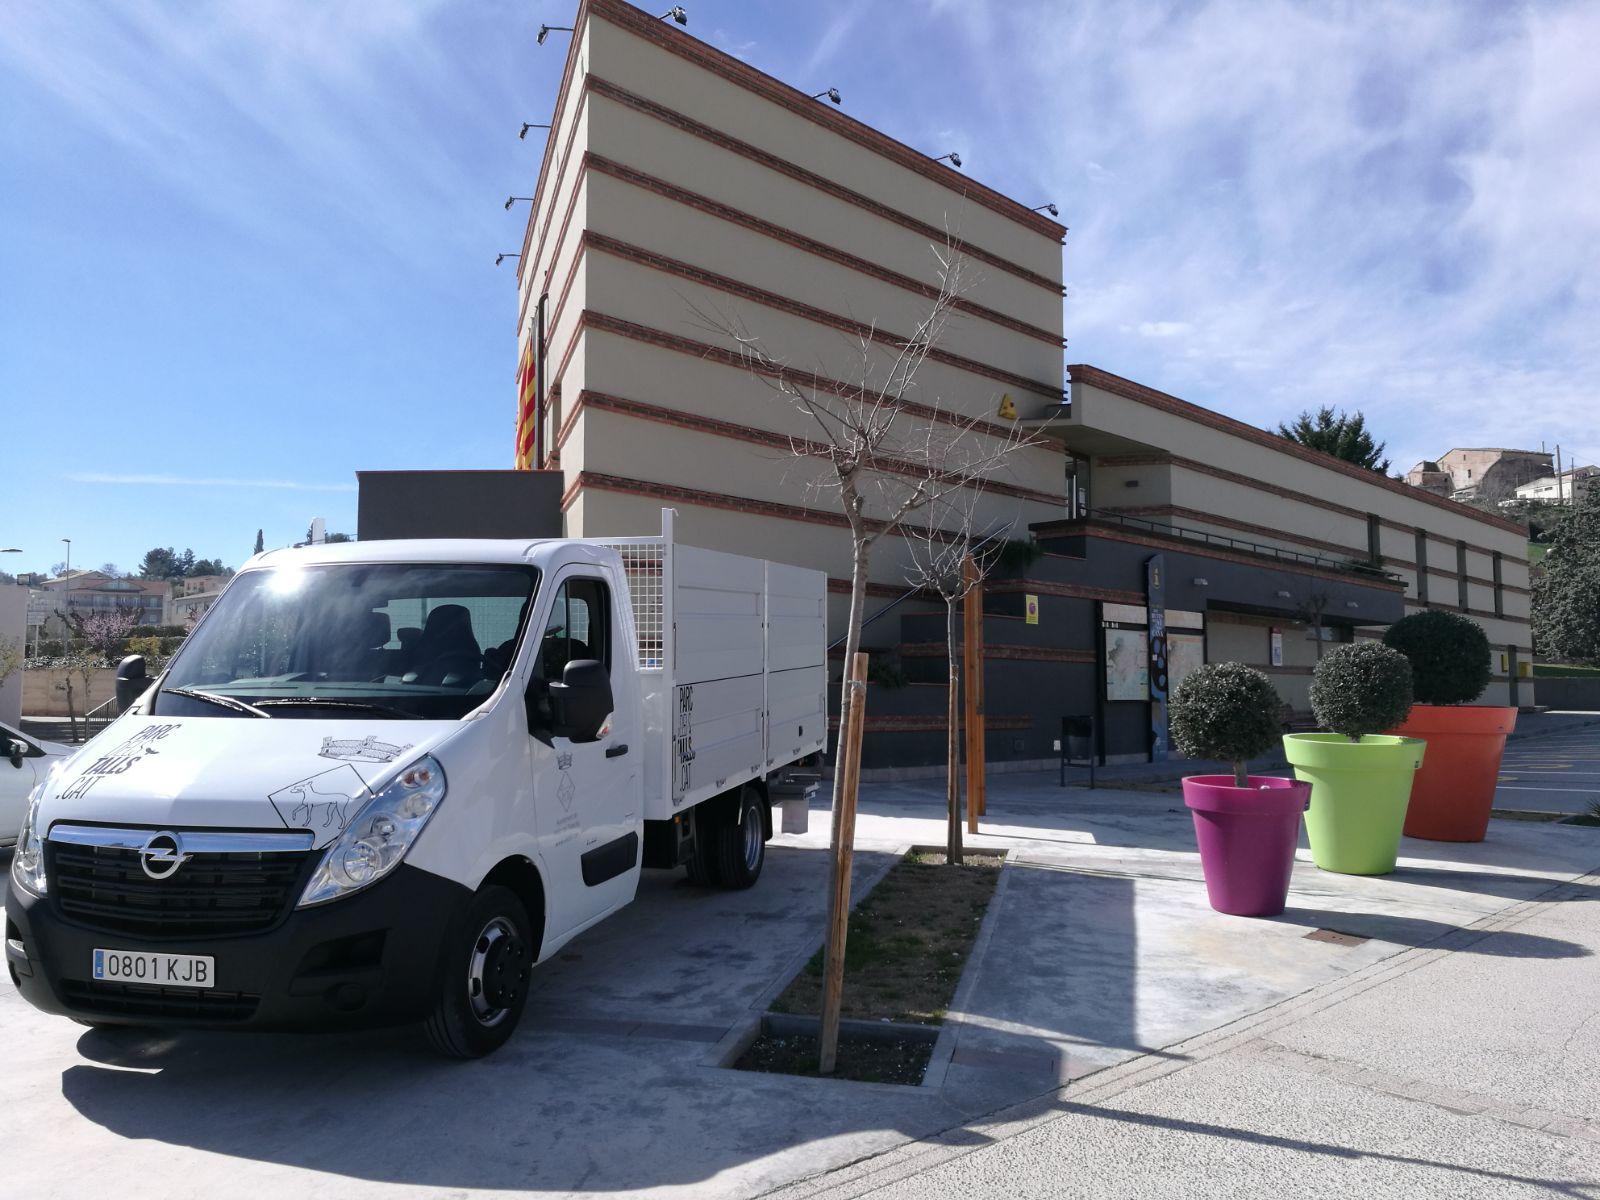 Nou camió municipal 2